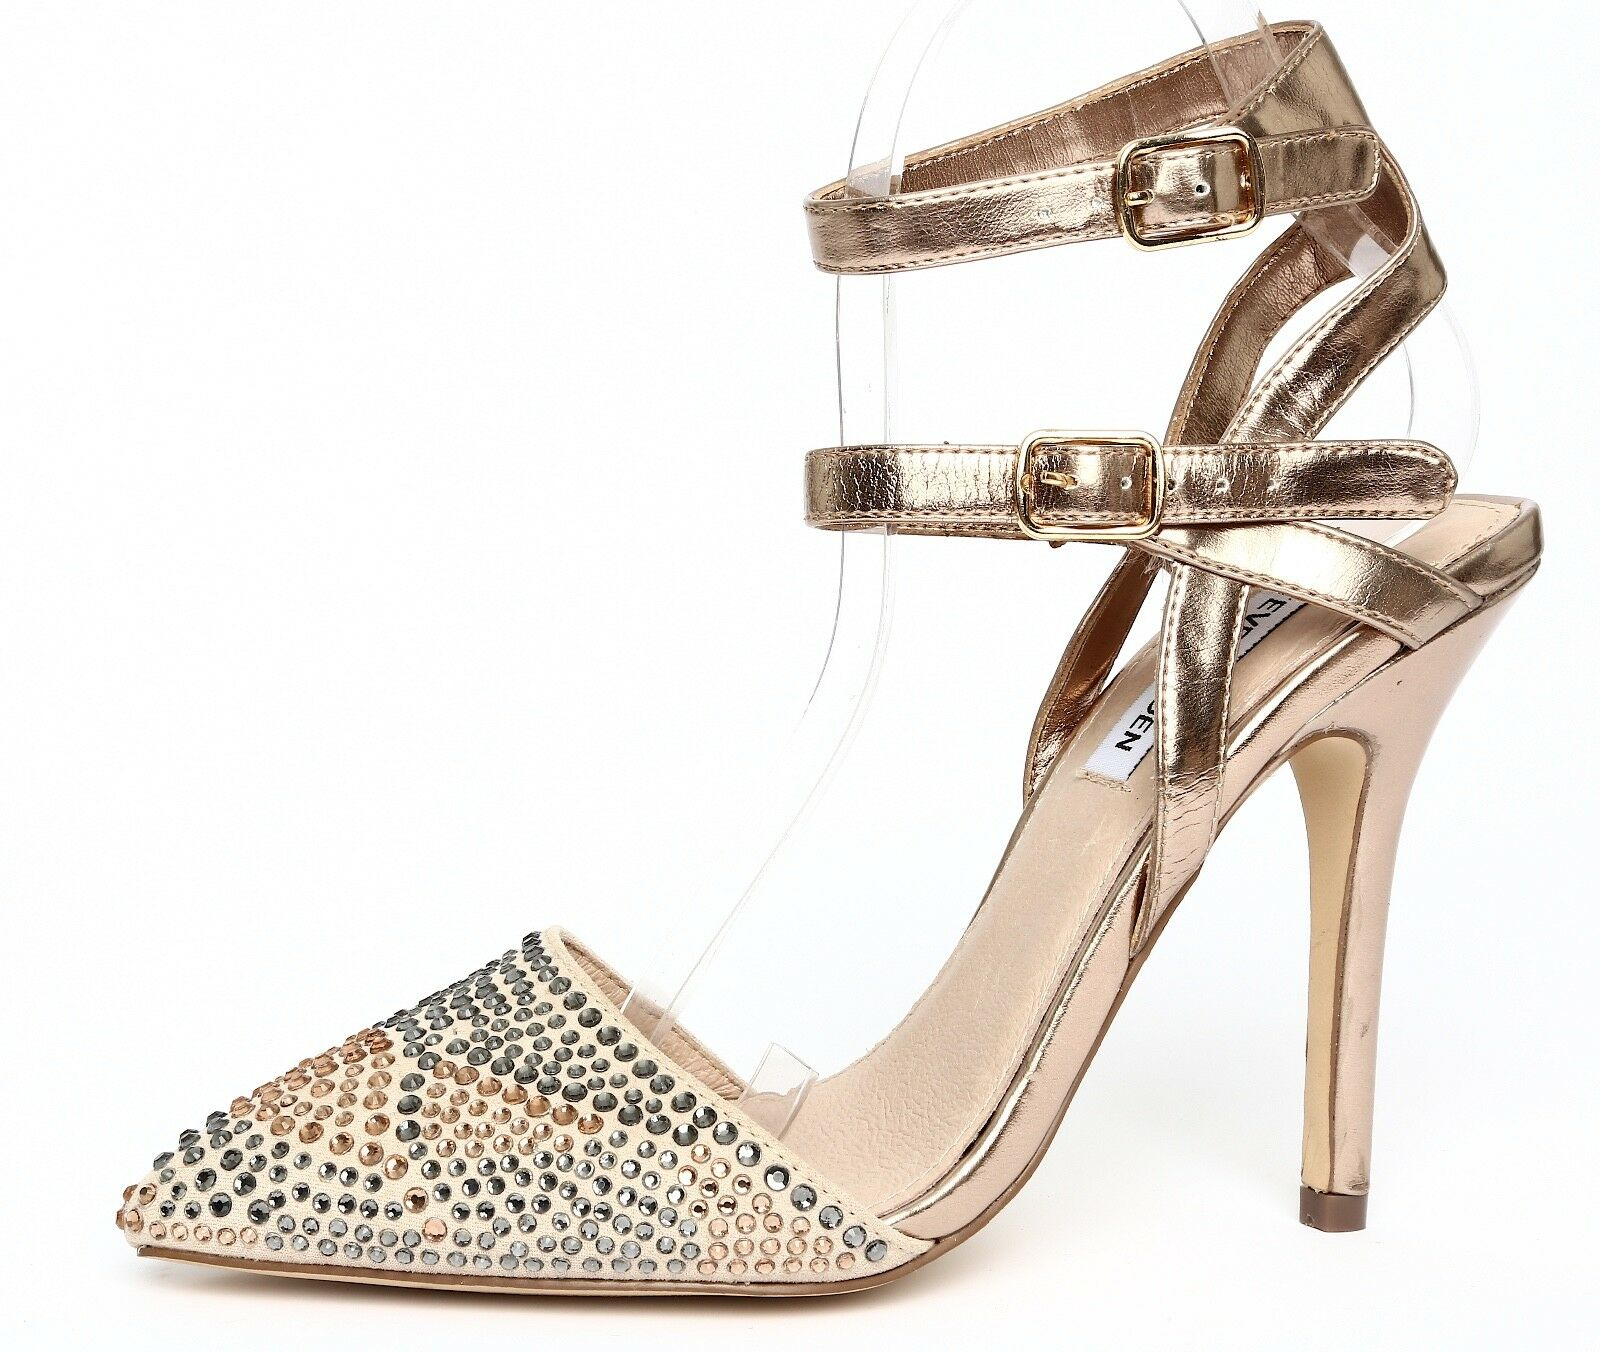 Steve Madden Portt-R Metallic gold Womens Ankle Strap Pump Heels Sz 8M 0906